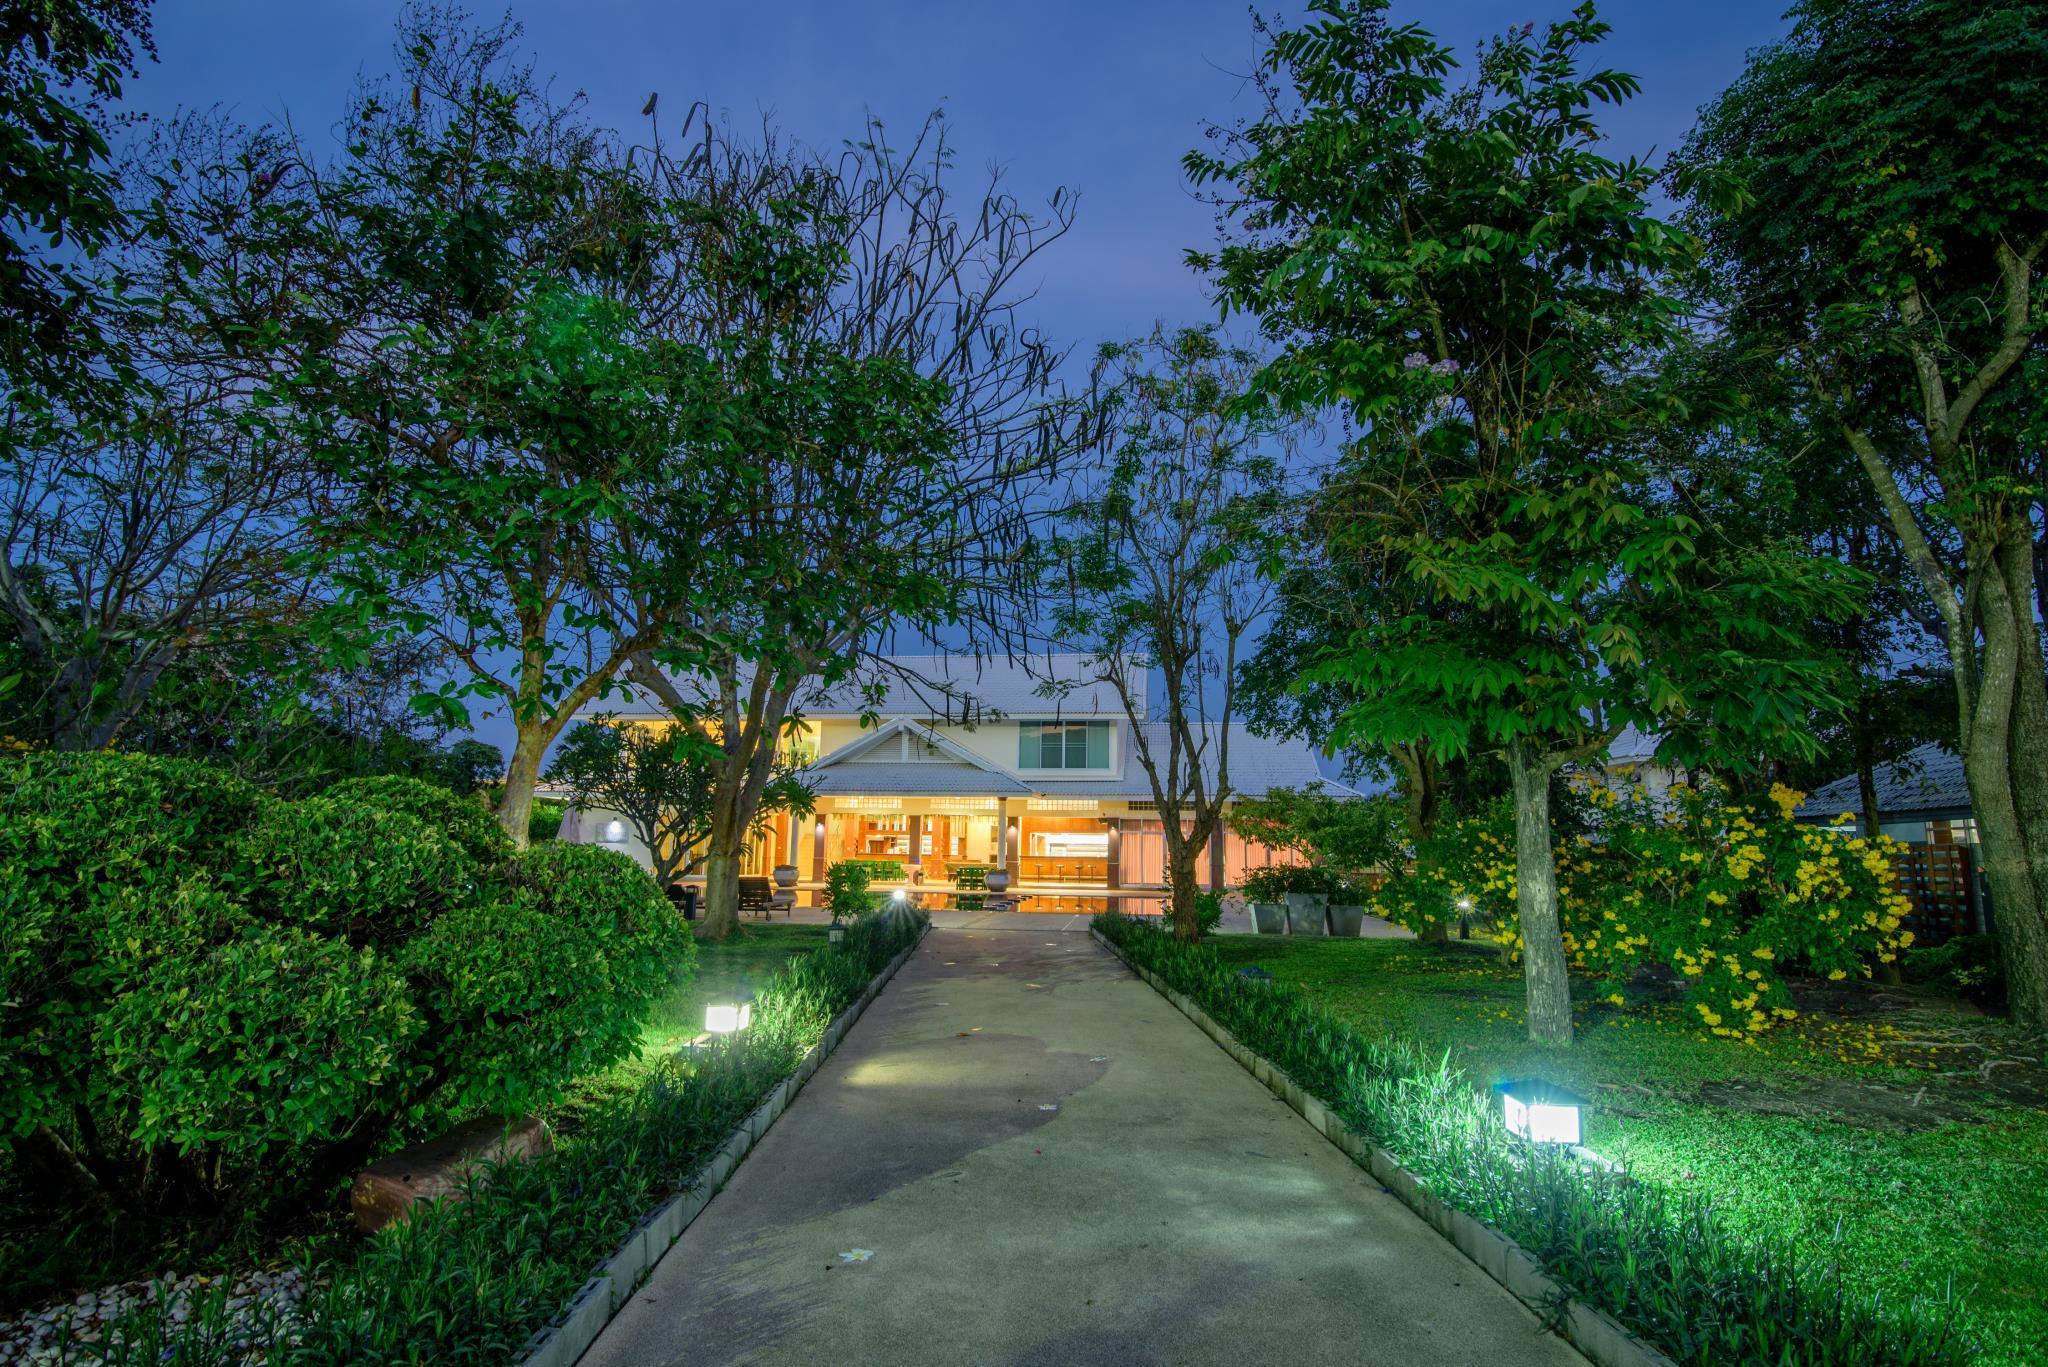 Hua Hin Condotel & Resort by Taweeporn, Hua Hin